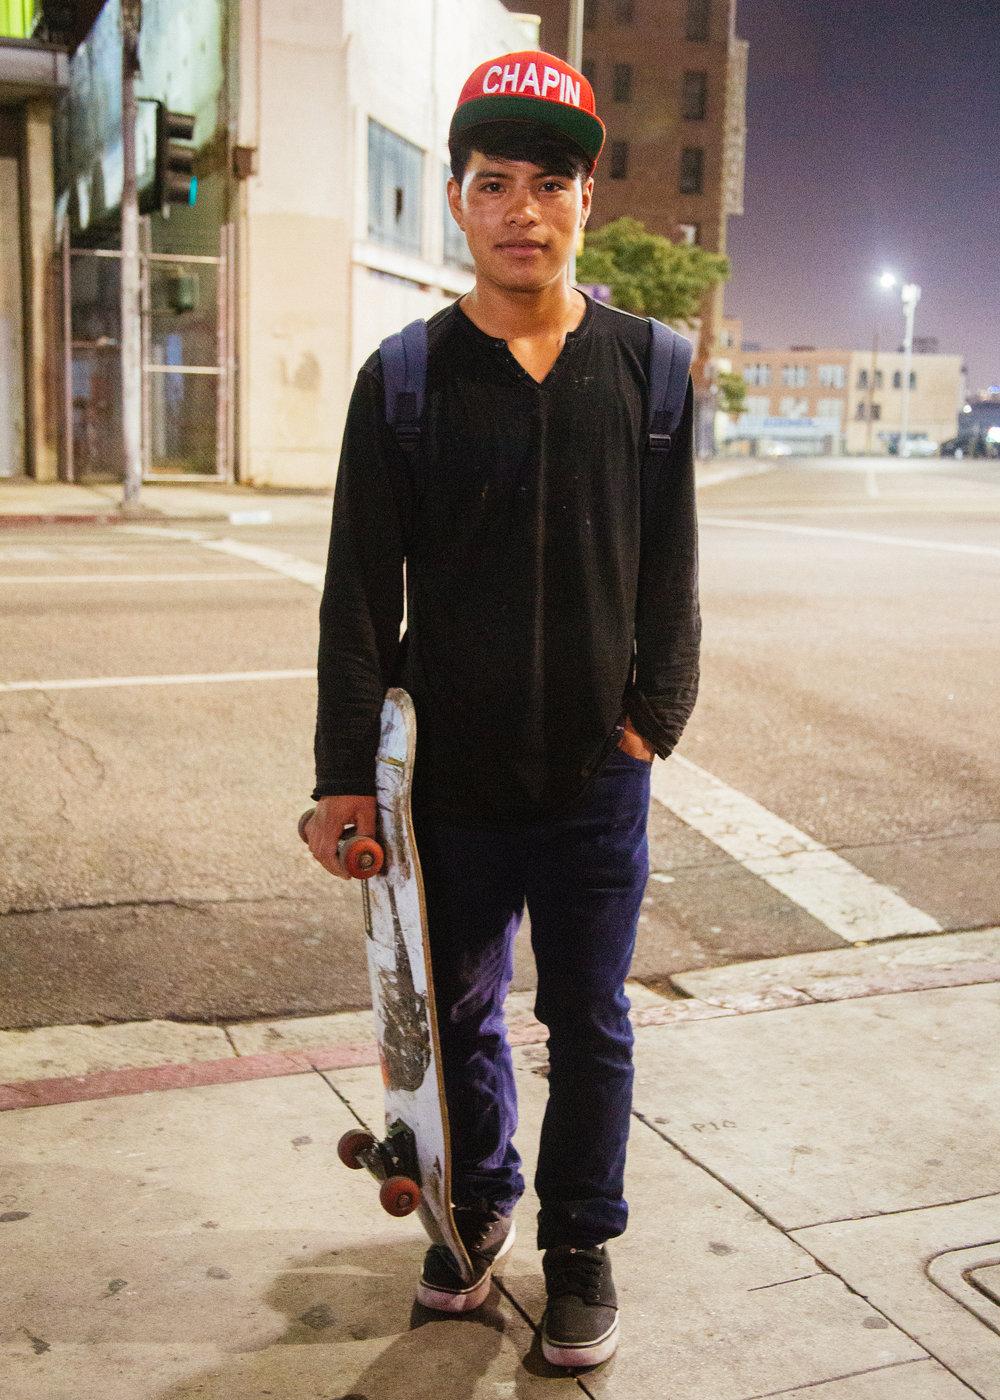 Chapin skater, Los Angeles, California 2016